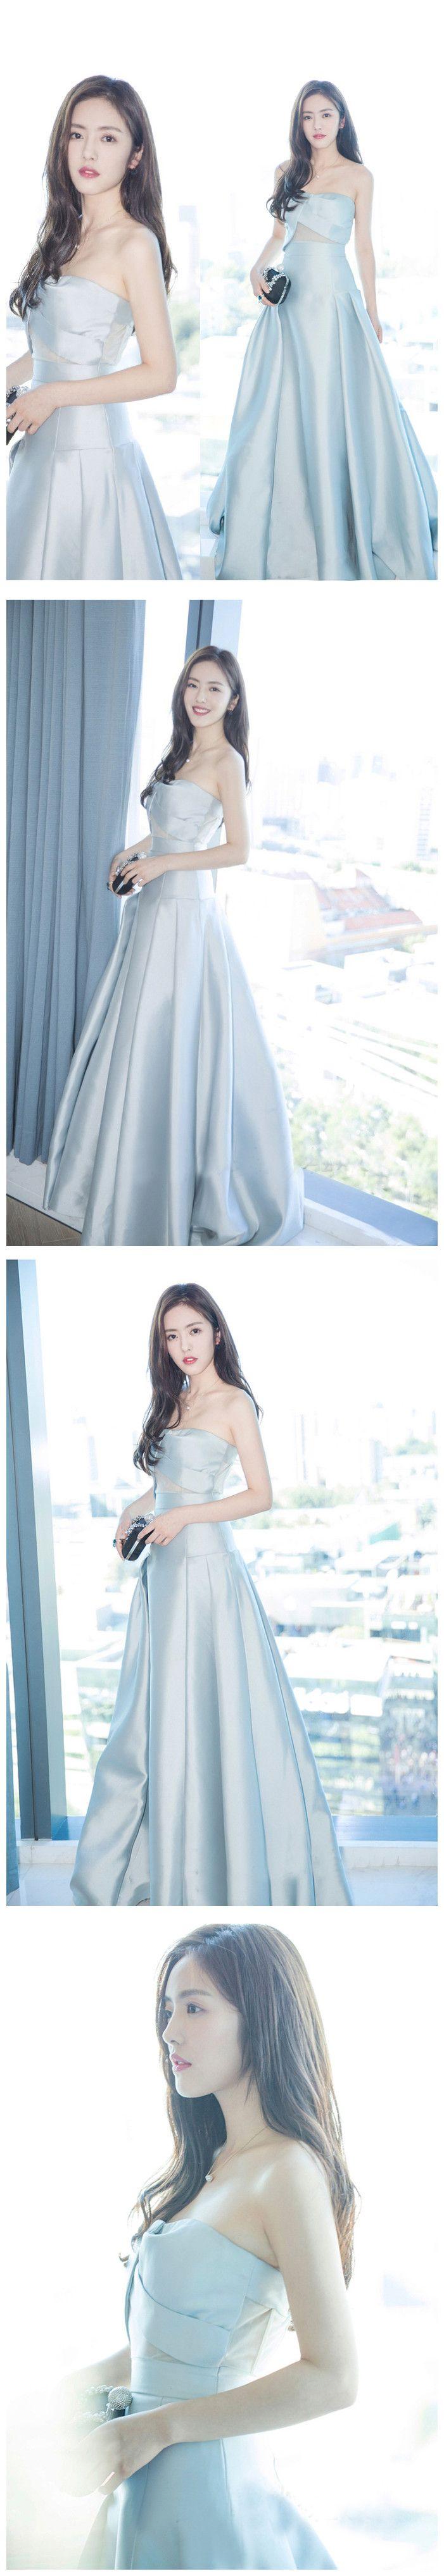 Chic aline prom dresses long blue strapless simple prom dress